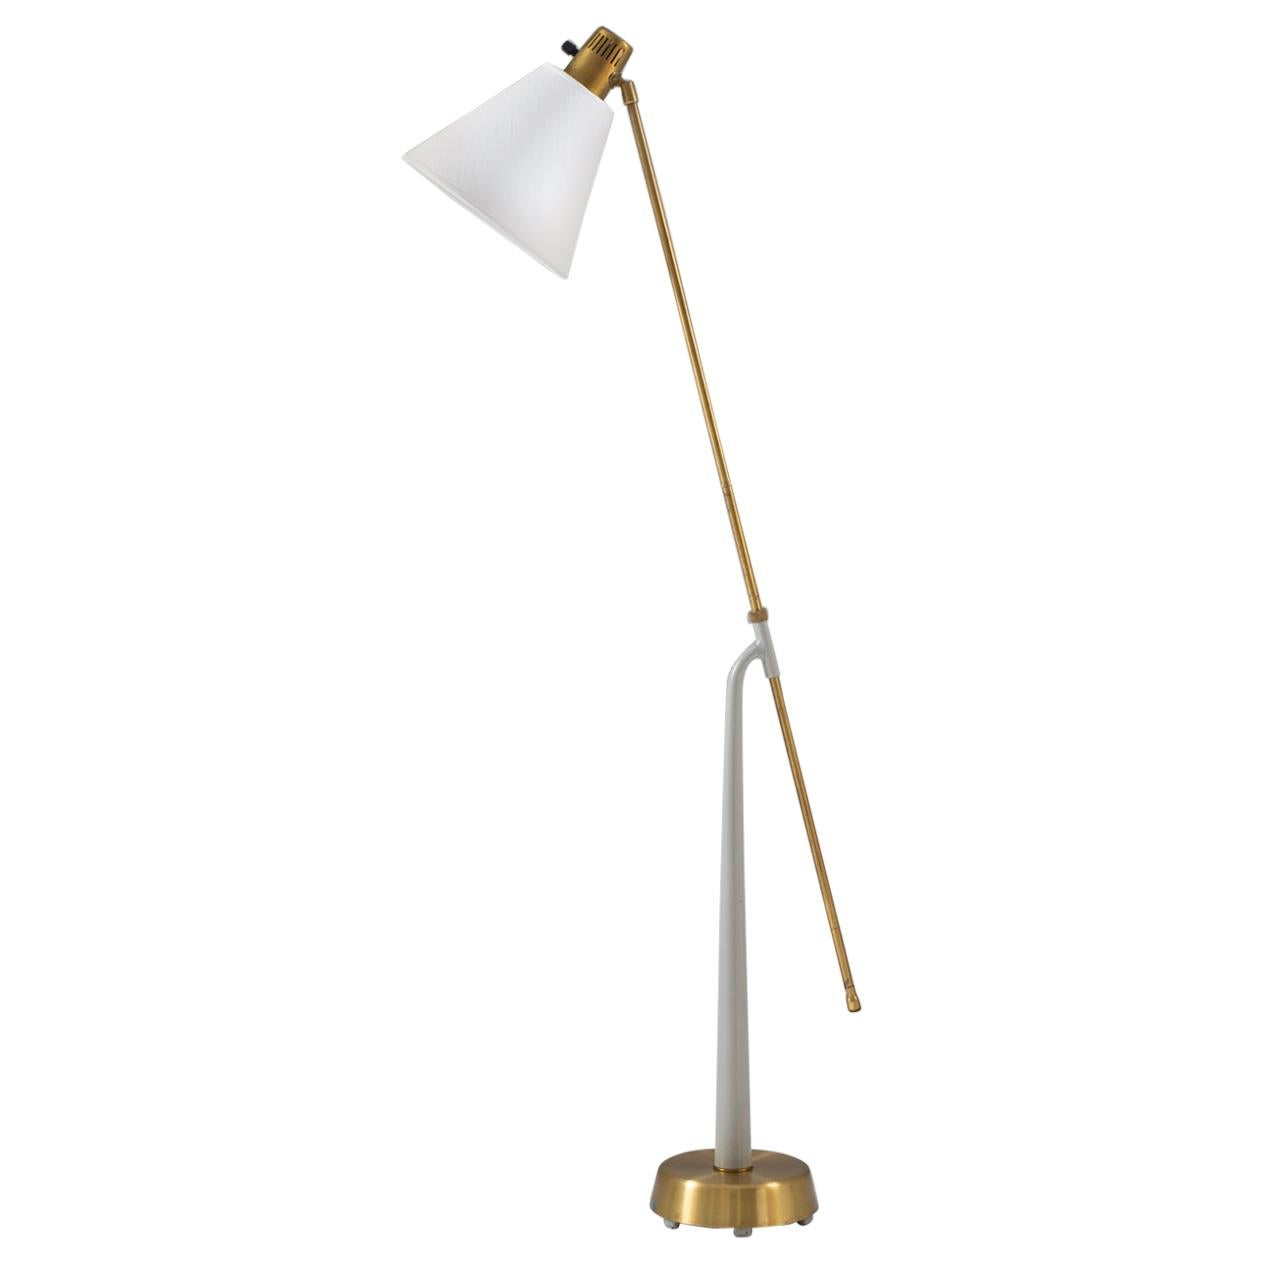 Midcentury Floor Lamp by Hans Bergström for Ateljé Lyktan, 1940s, Sweden